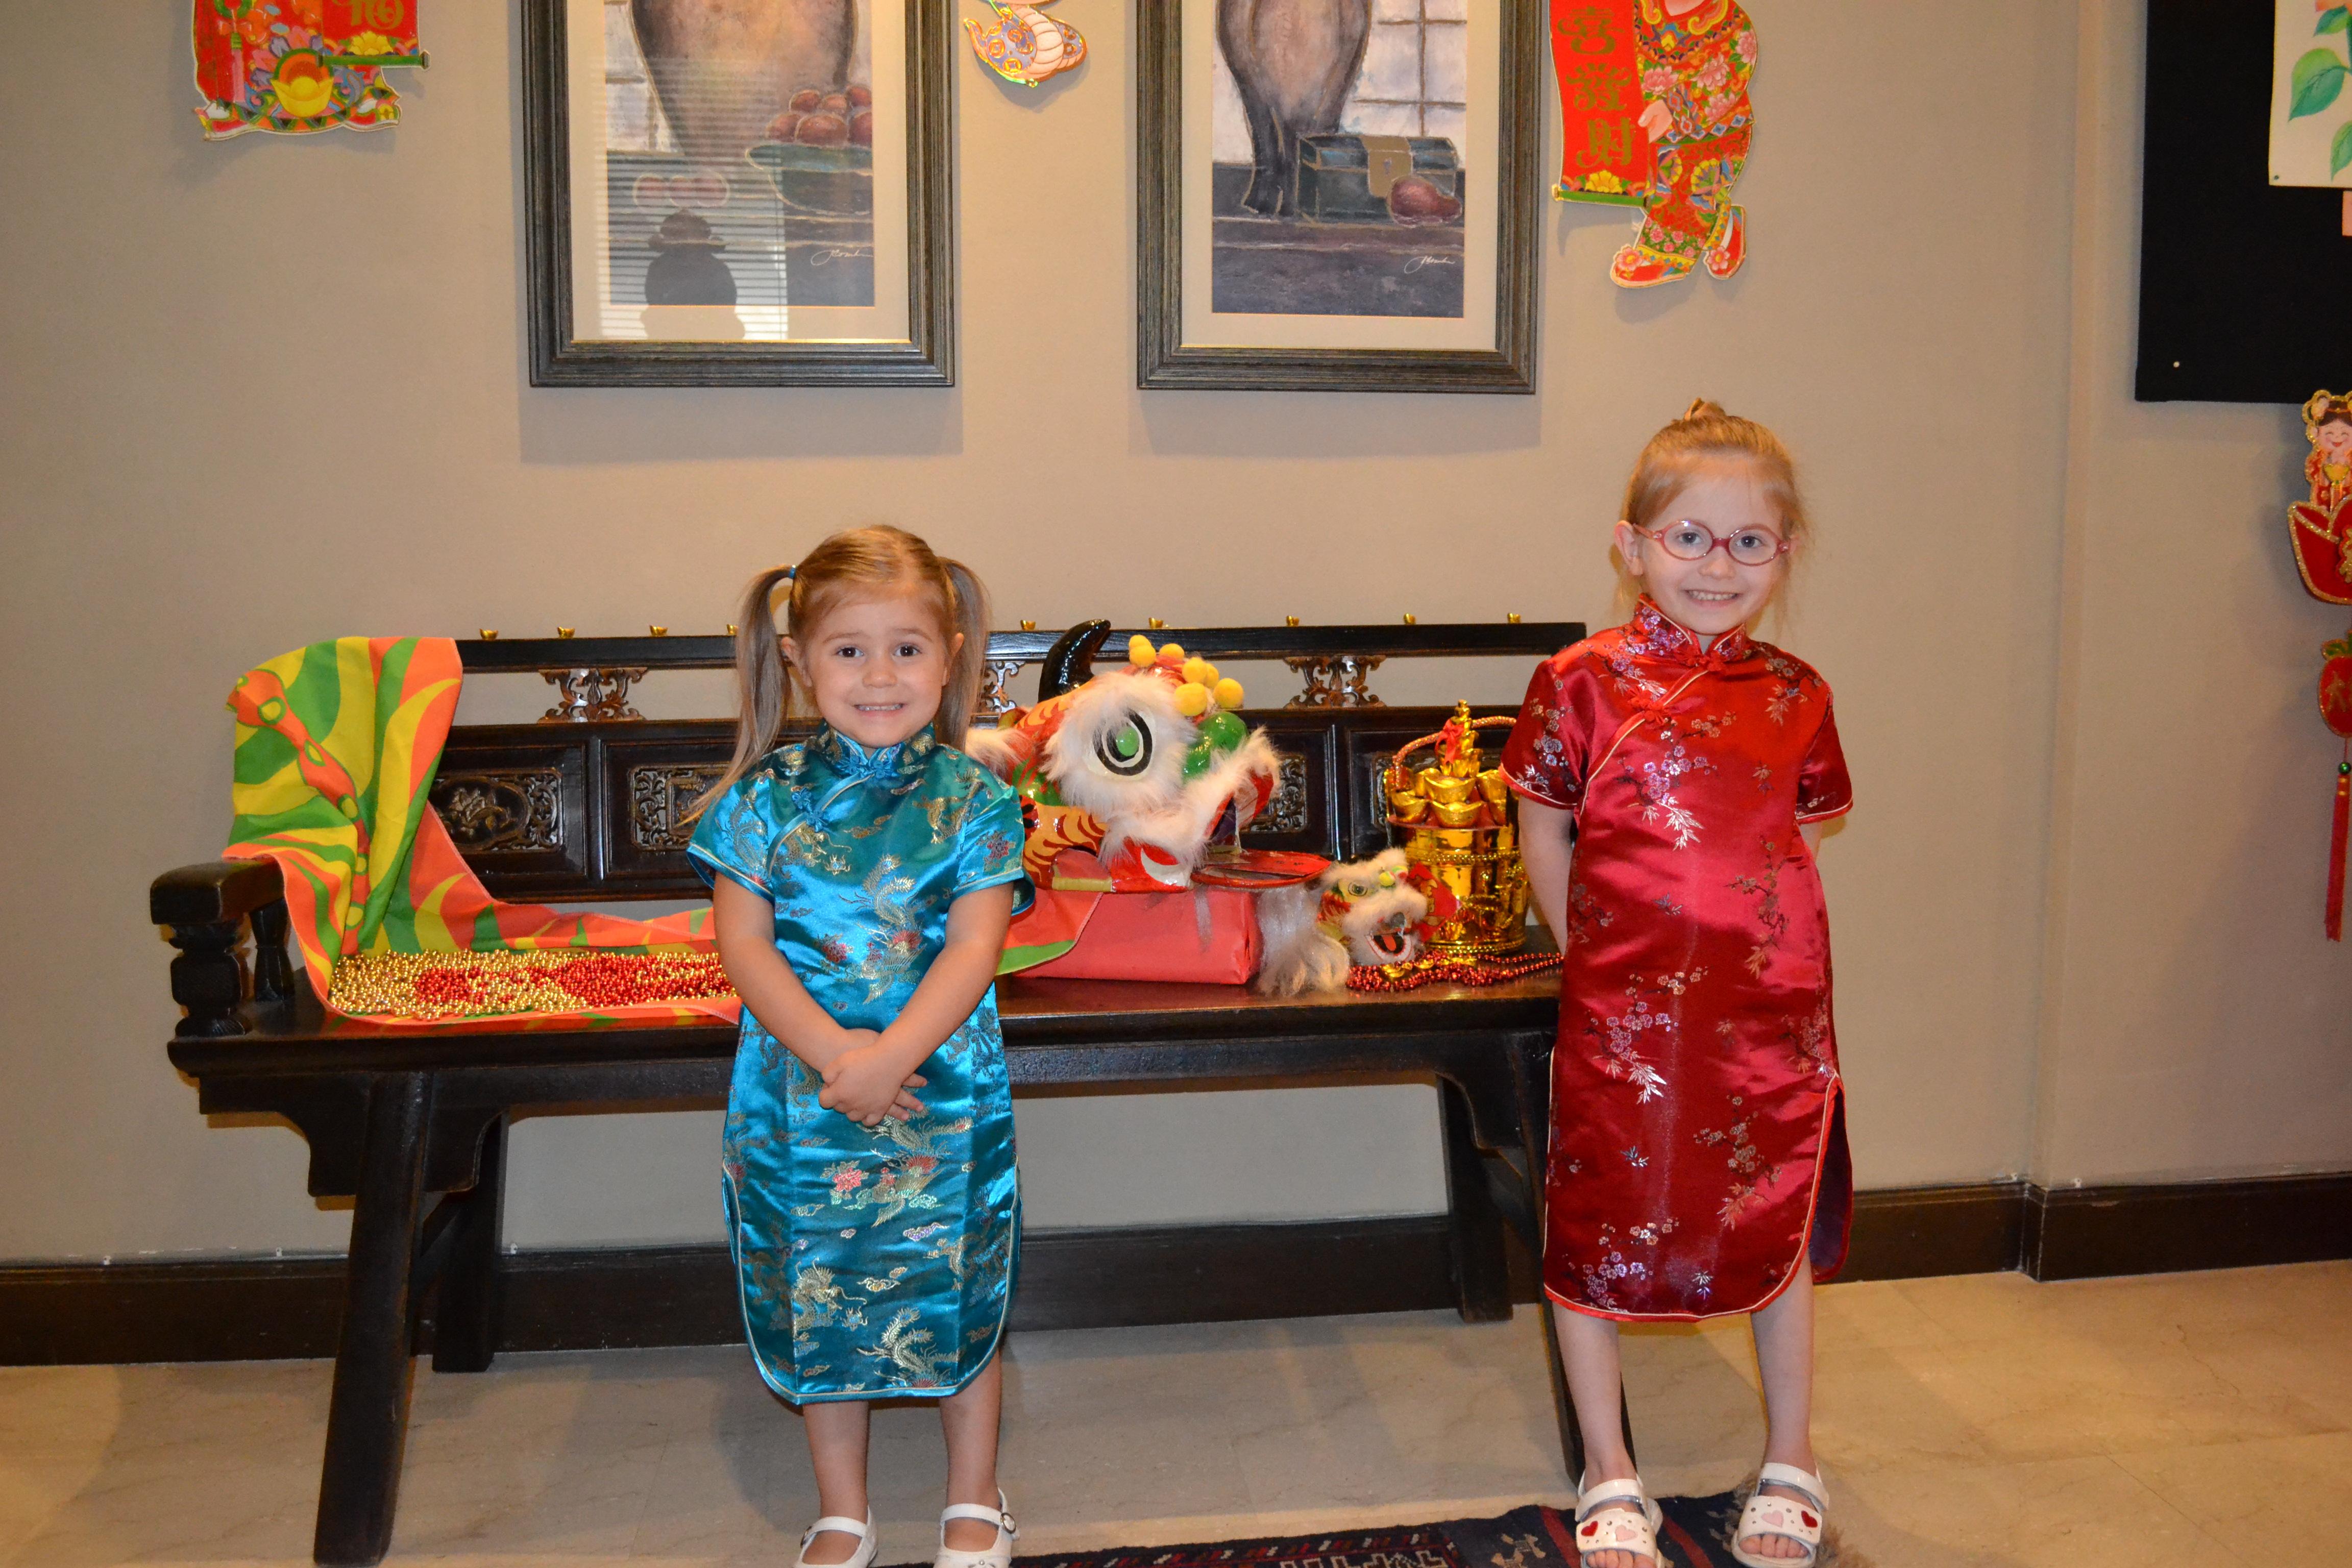 Chinese New Year | Expat Adventure